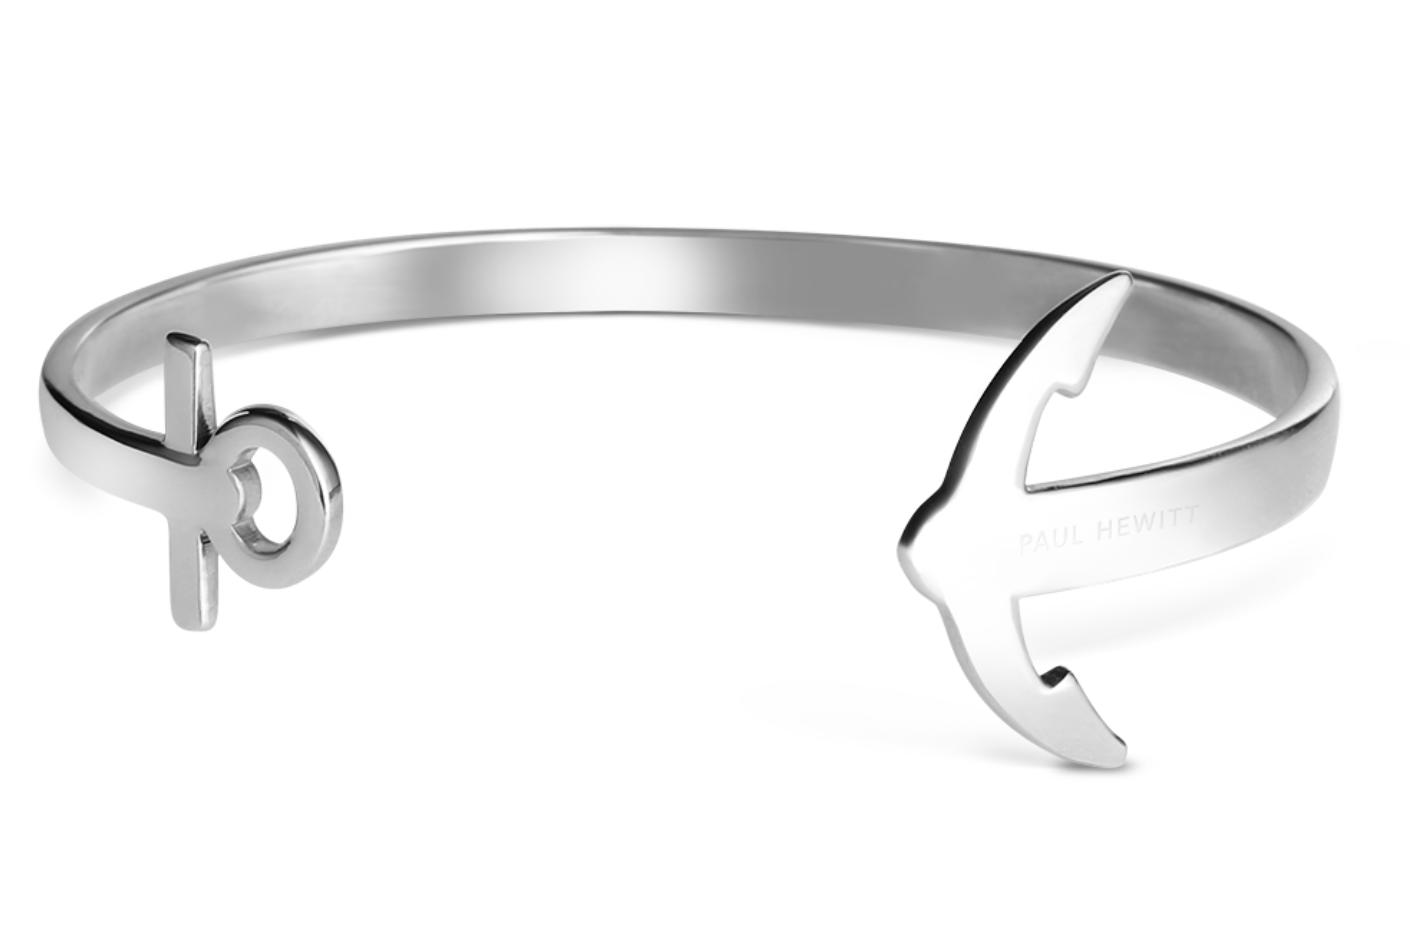 Bracelets Ancuffs